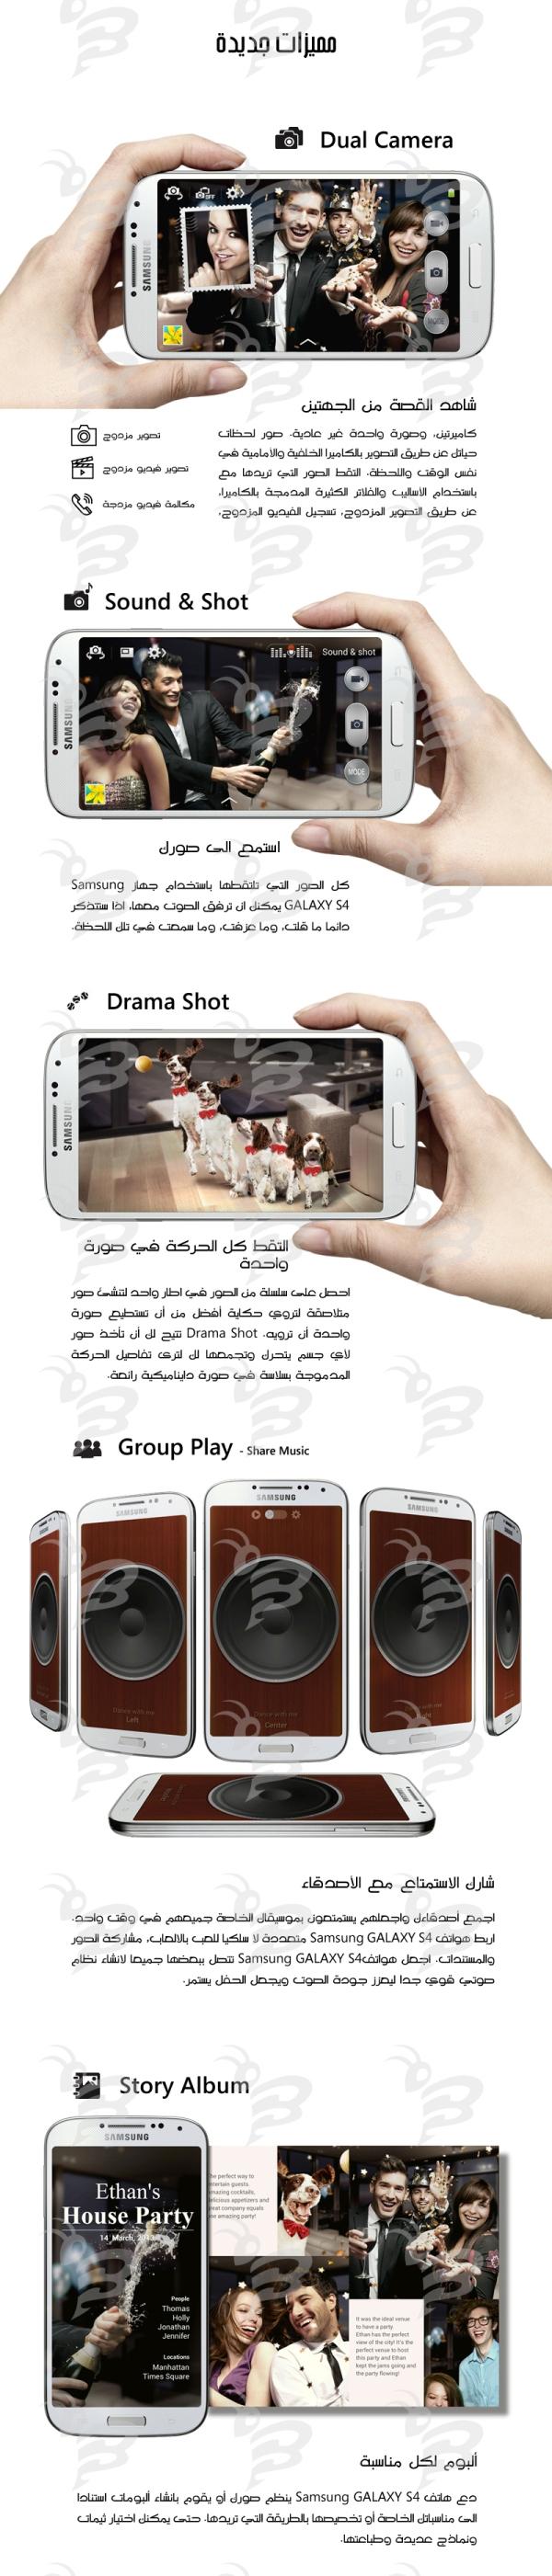 Samsung Galaxy S4 - Arabic - Final 4